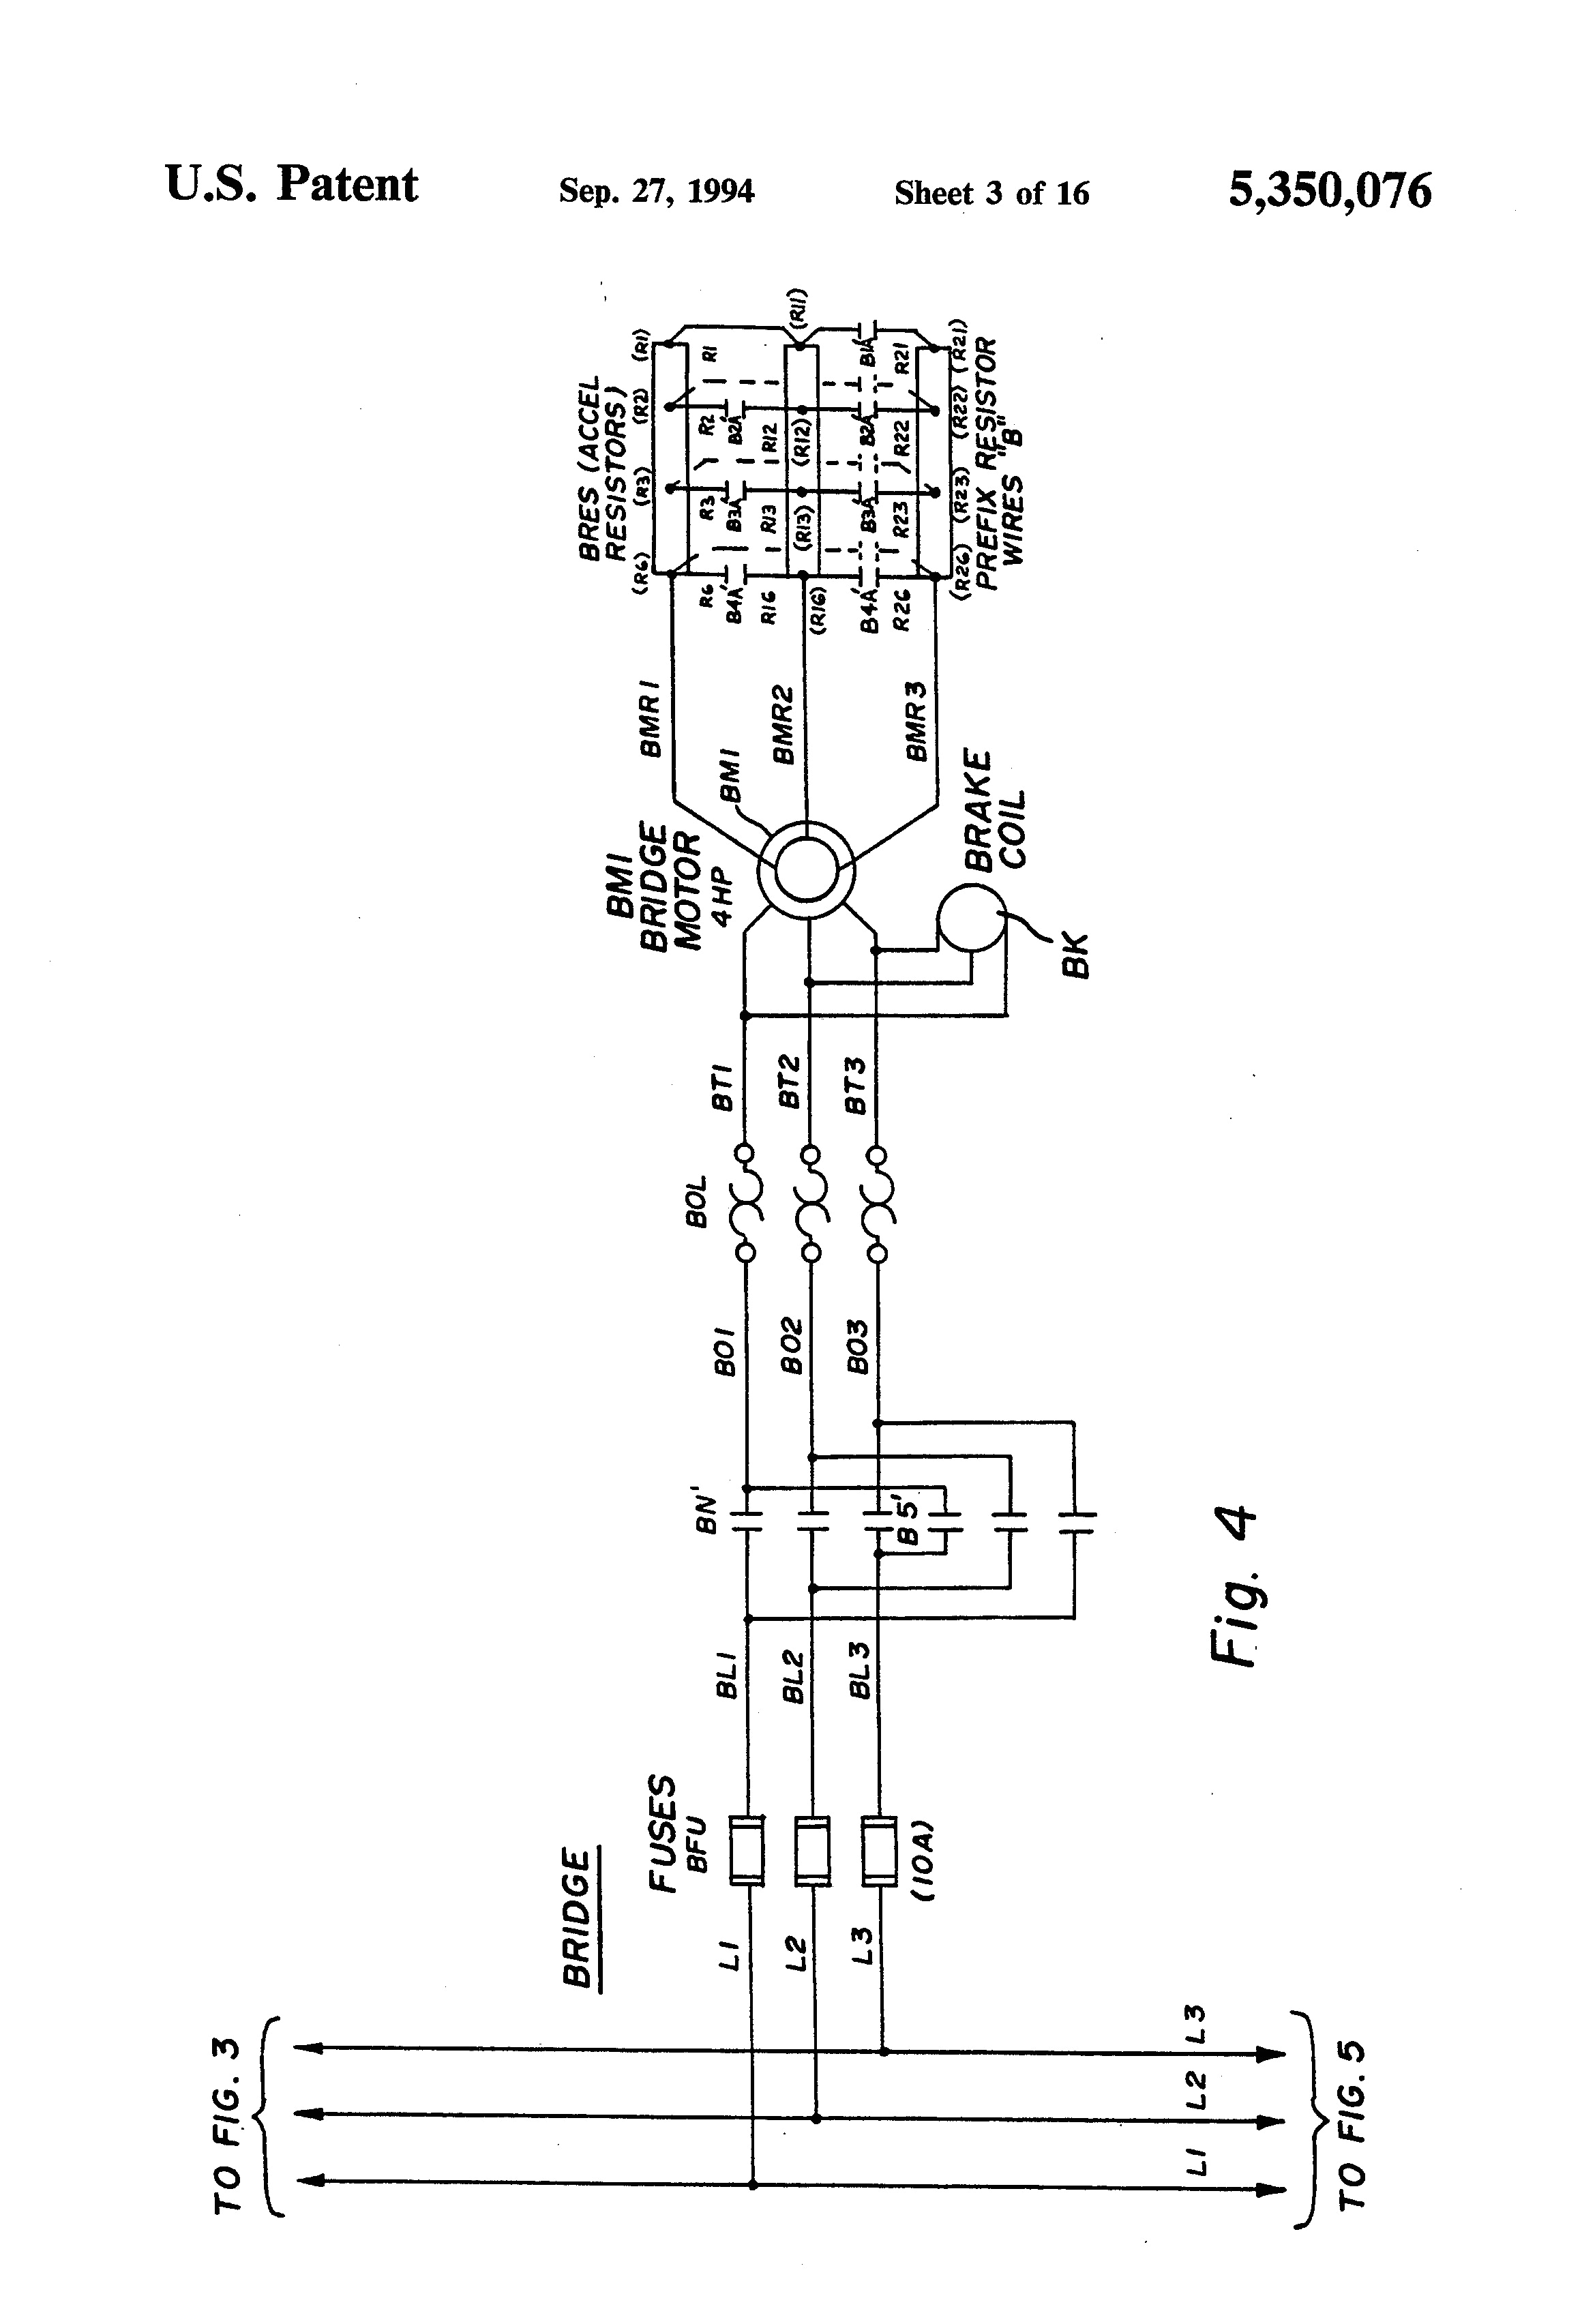 allen bradley motor control wiring diagrams inspirational vfdamazing allen bradley motor control wiring diagrams 22 about